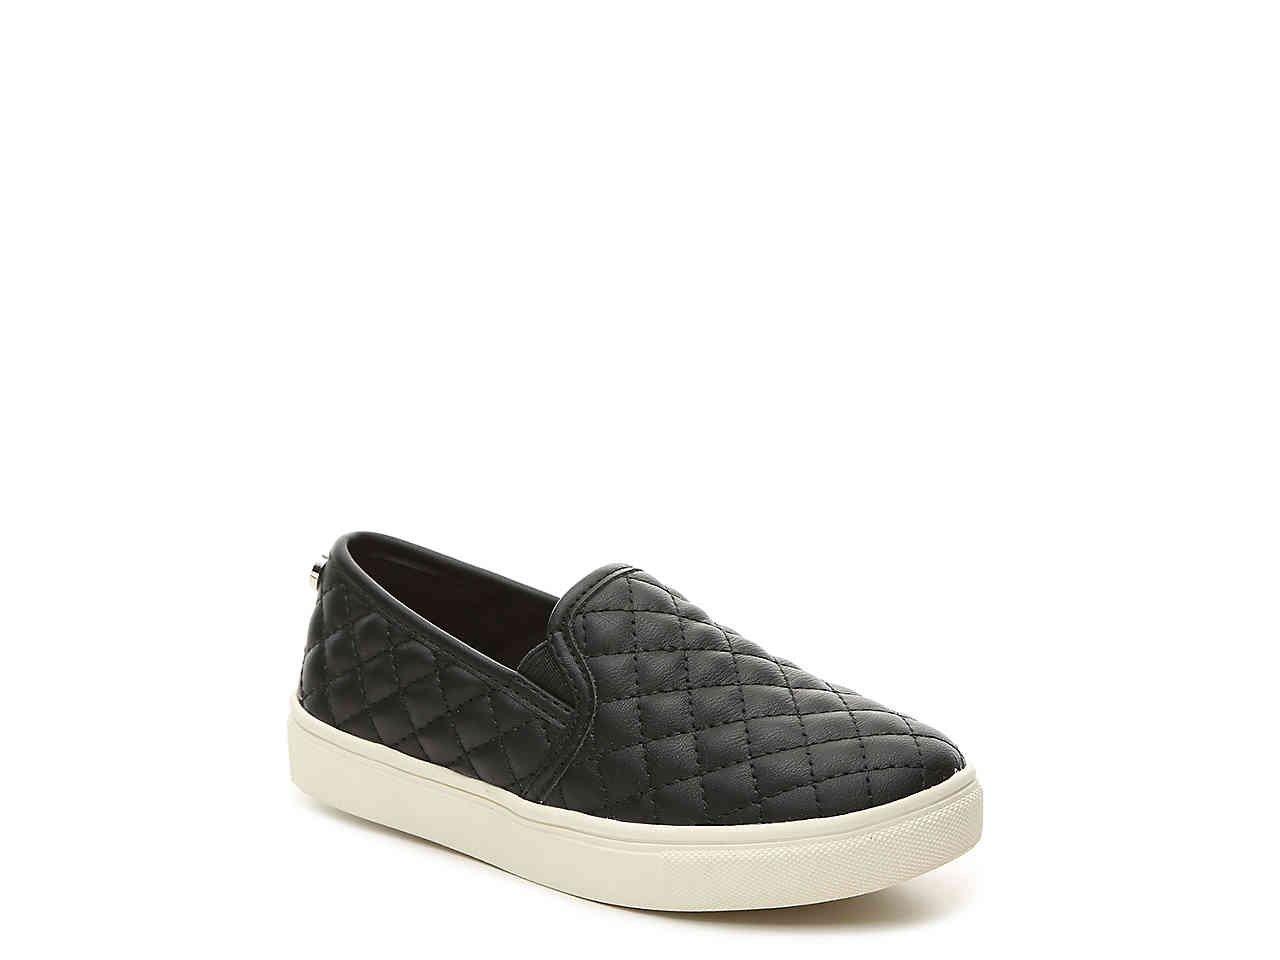 Steve Madden Ecntricq Youth Slip-On Sneaker Kids Shoes | DSW